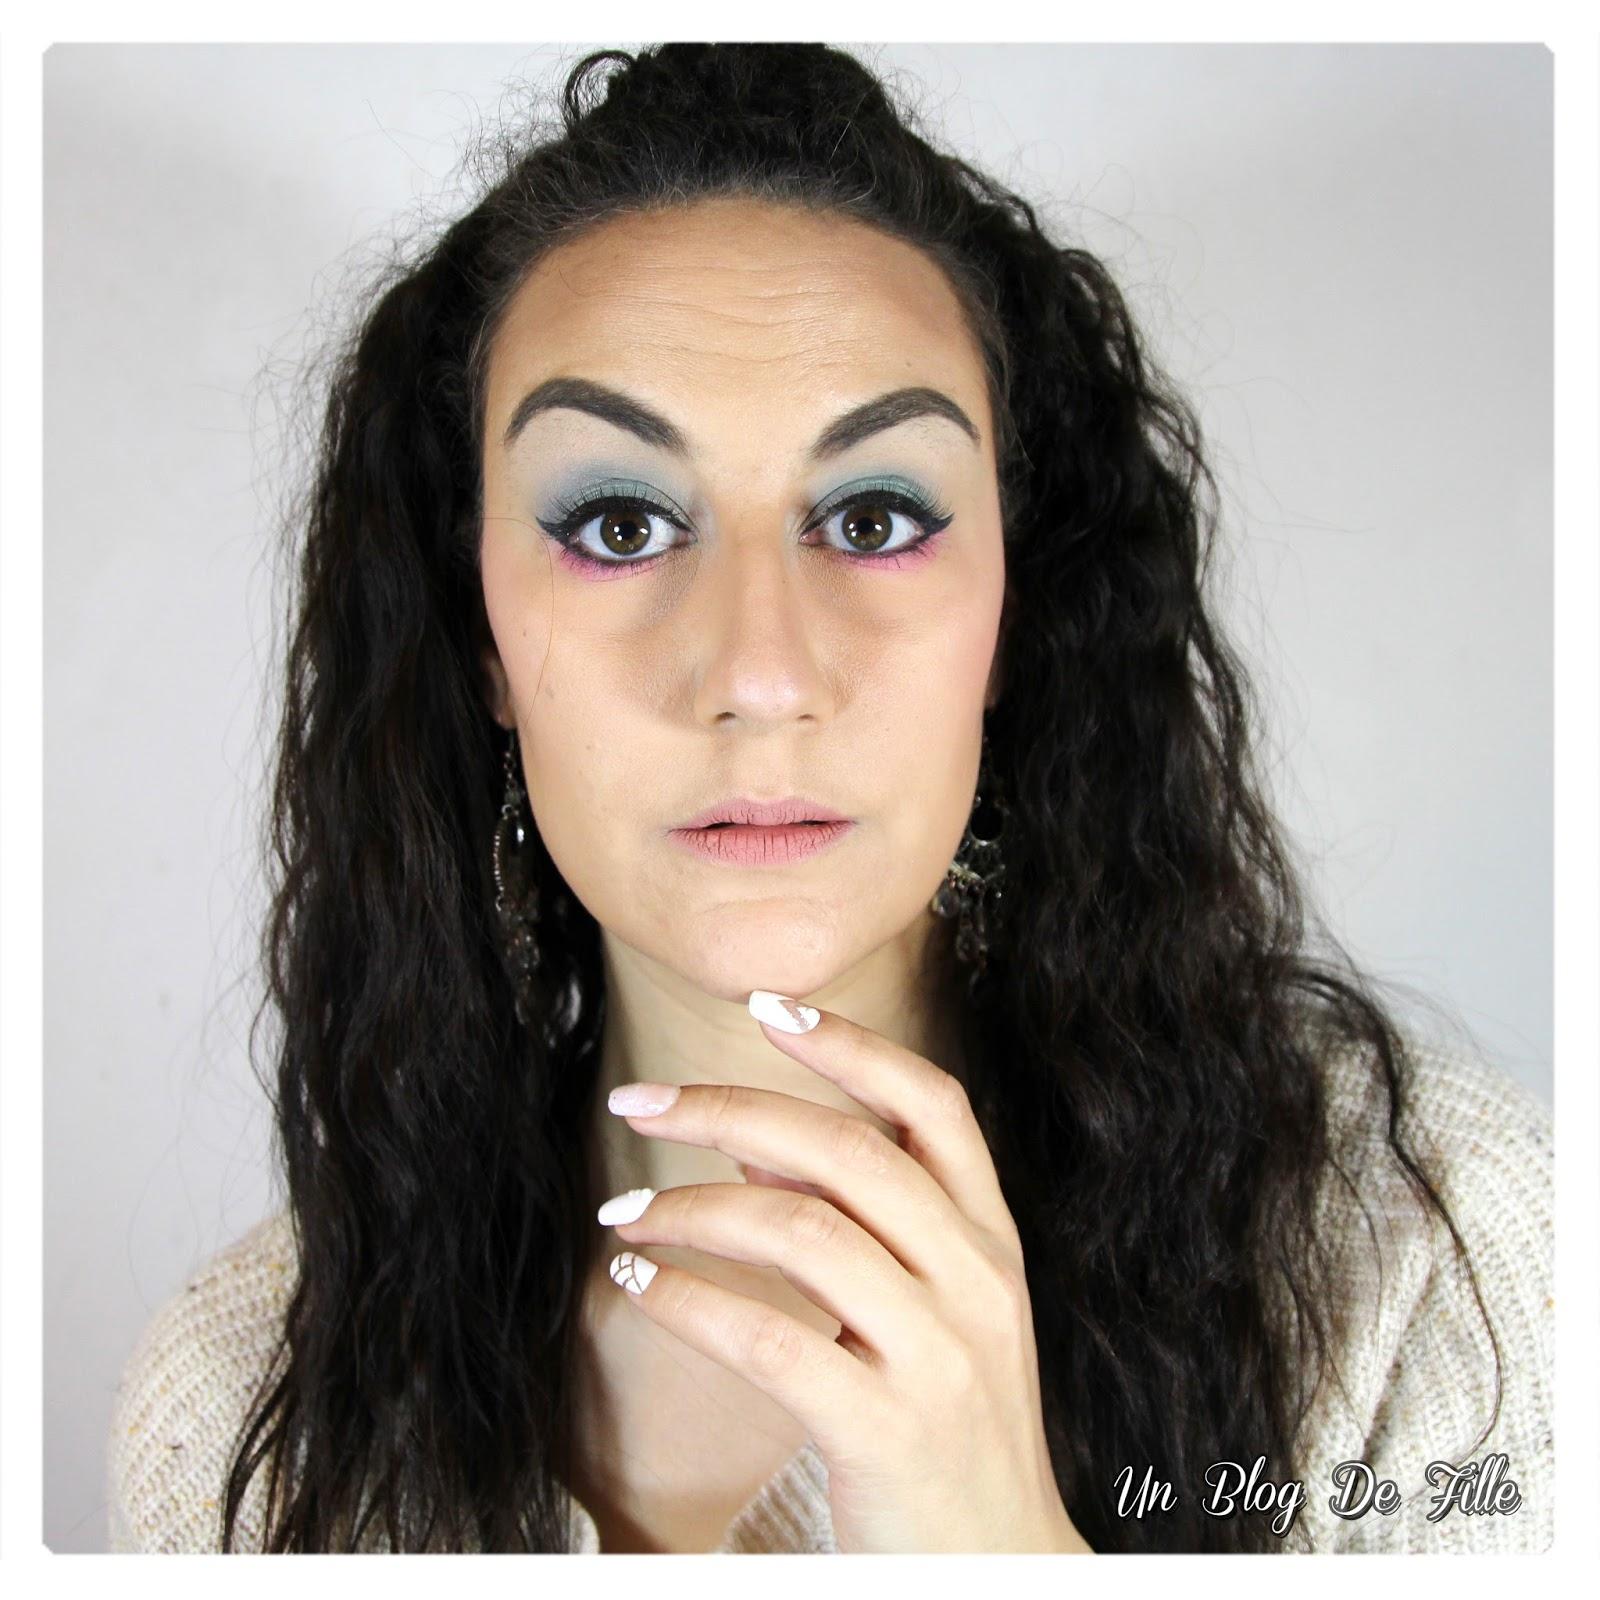 https://unblogdefille.blogspot.fr/2018/04/maquillage-violine-et-turquoise-msc.html